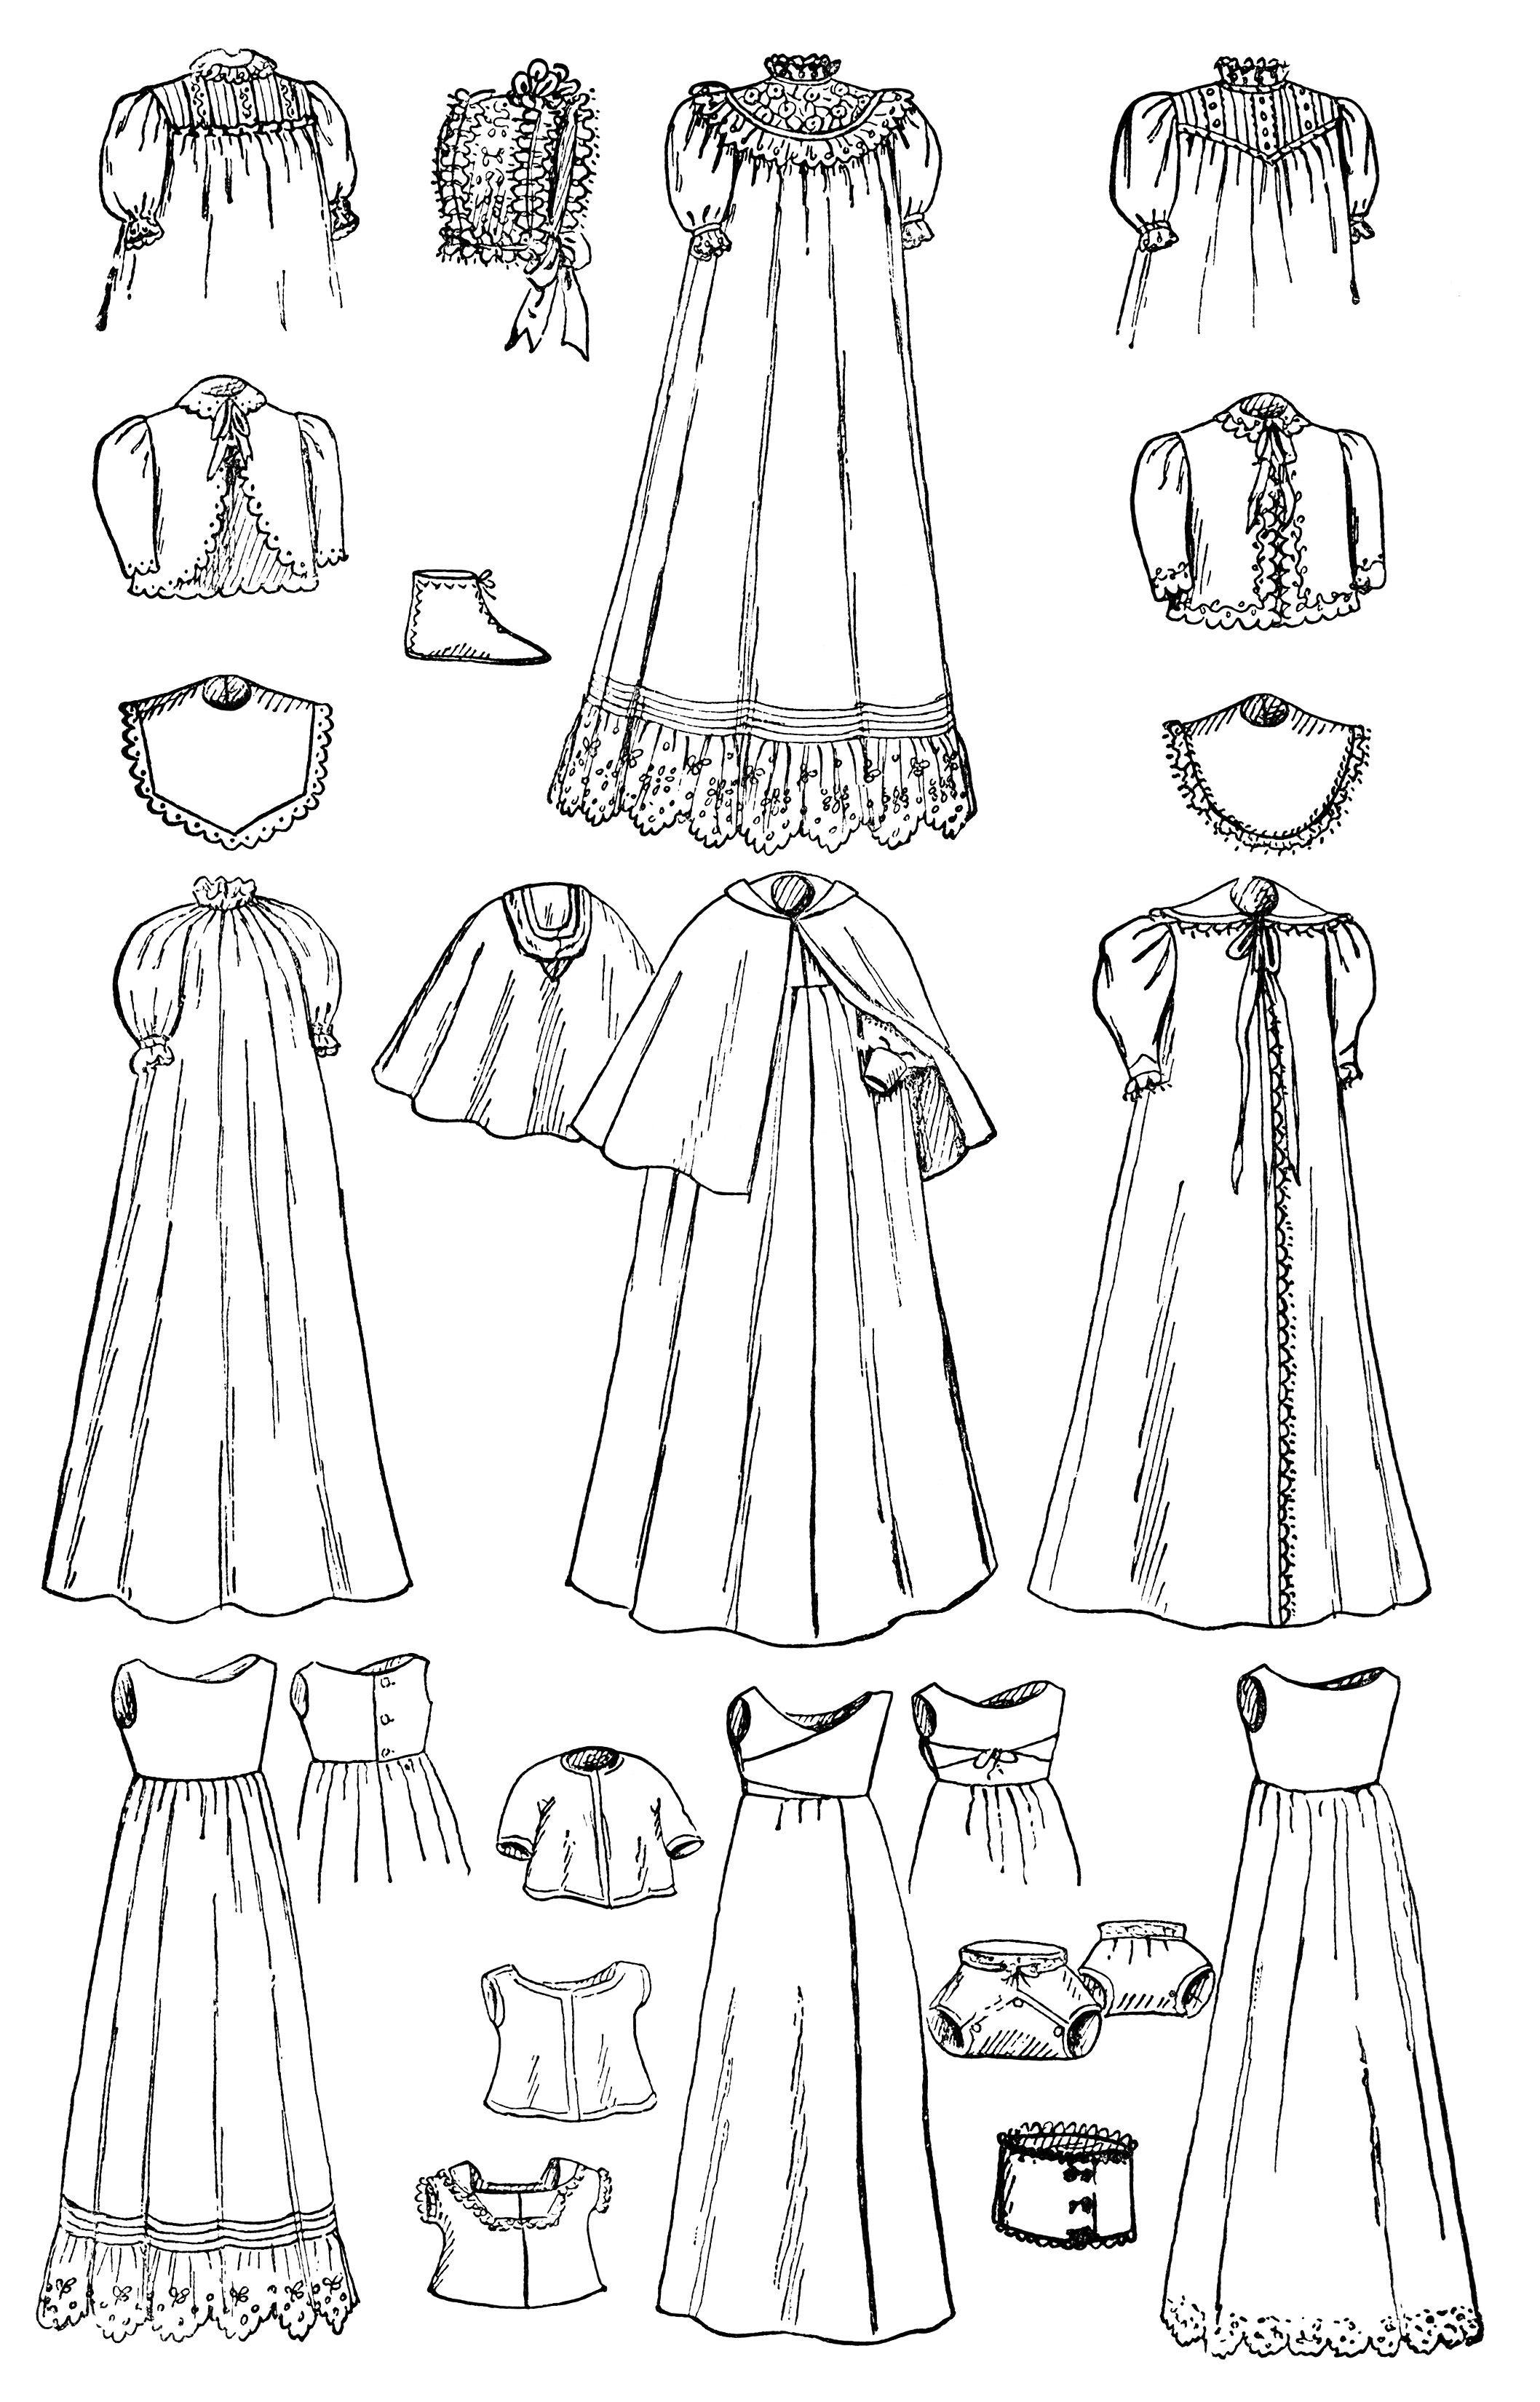 Vintage Baby Clip Art Black And White Graphics Infants Wardrobe Illustration Antique Magazine